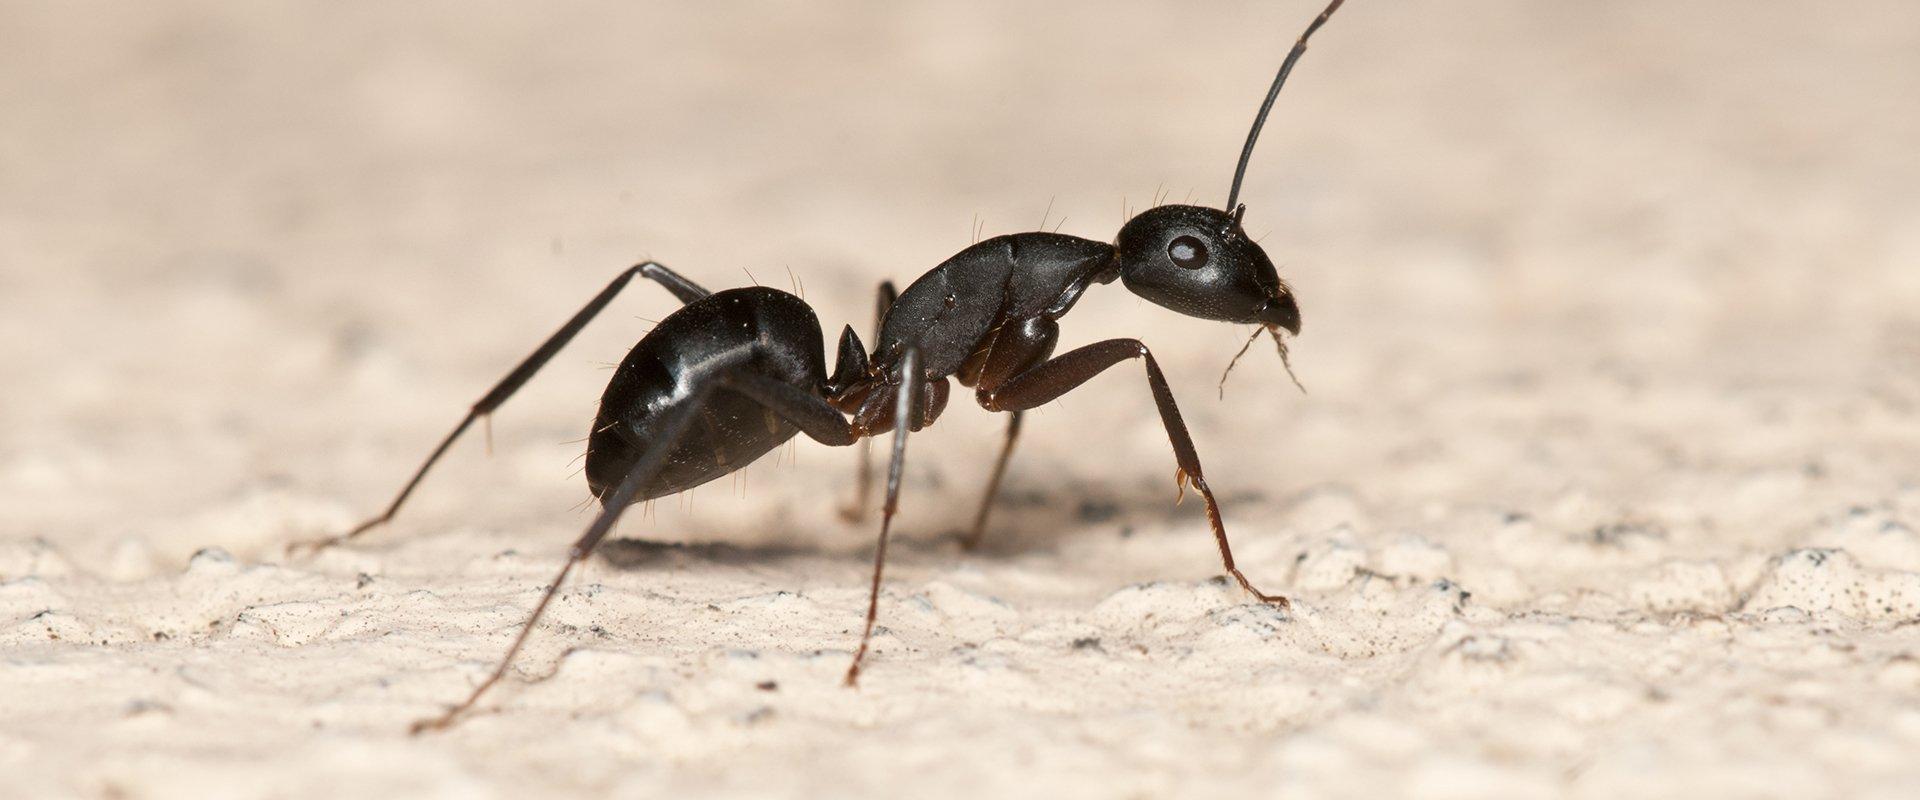 carpenter ant crawling on kitchen surface